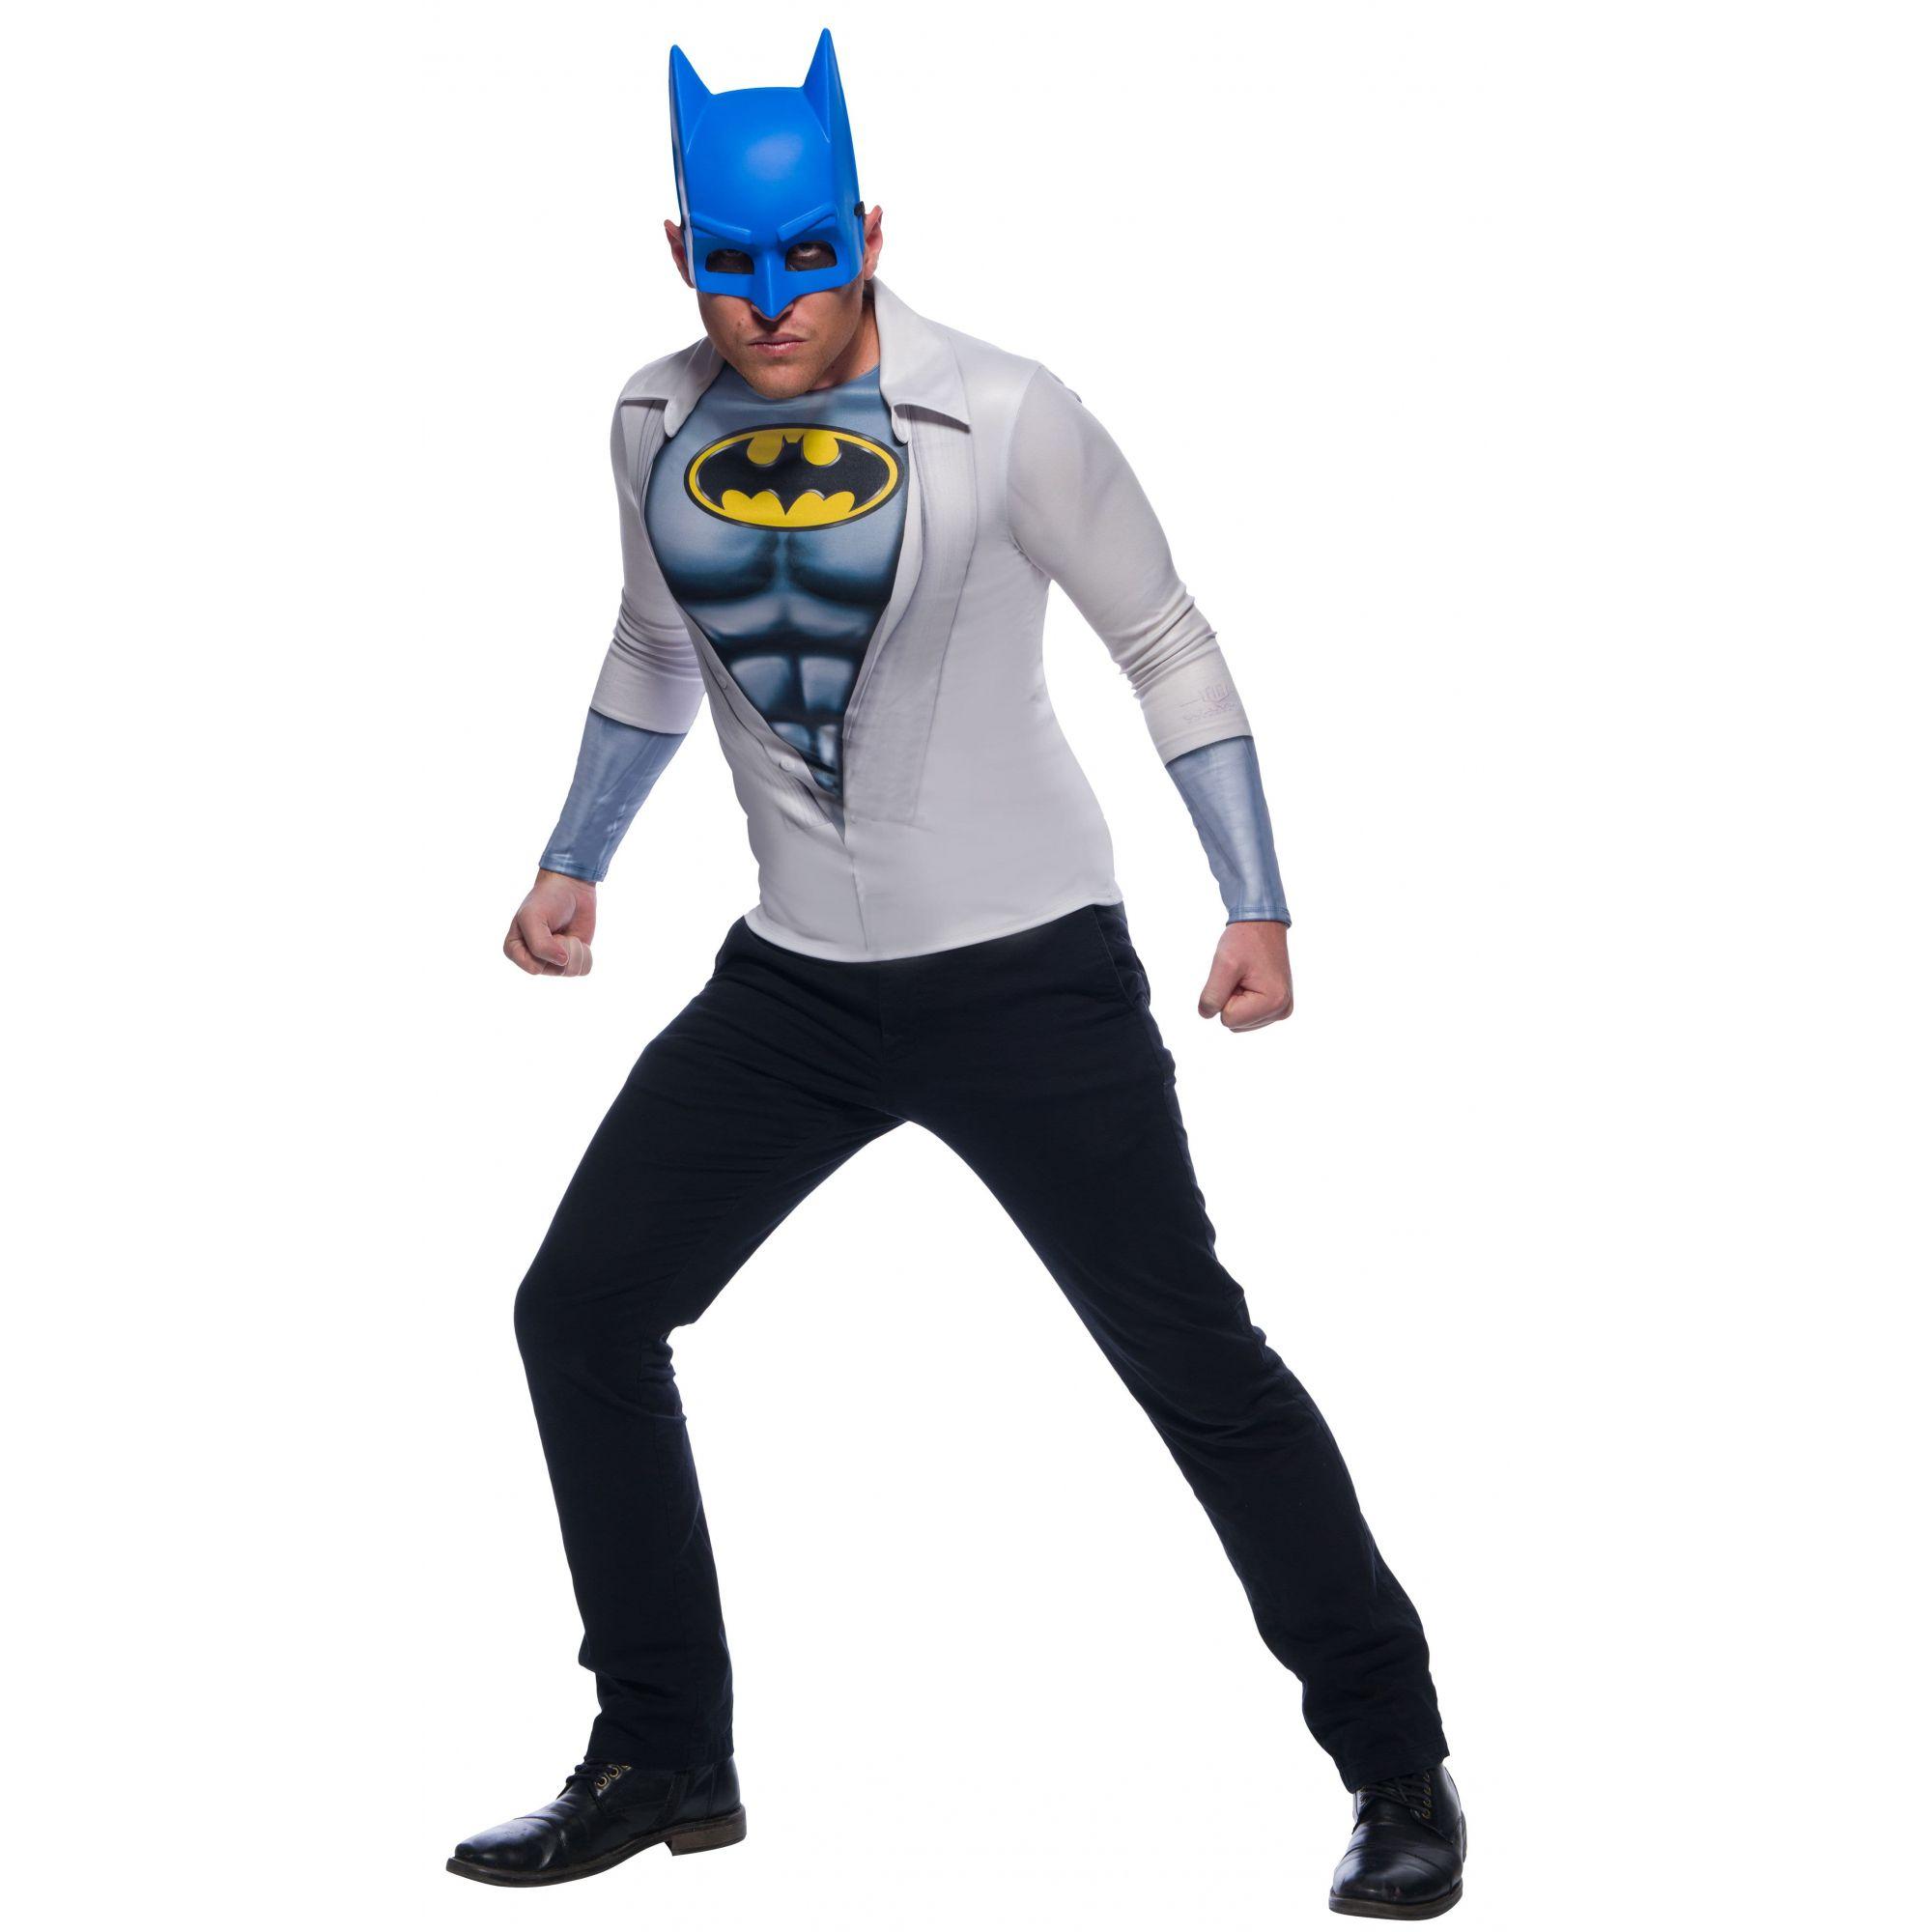 Fantasia Batman: Batman Photoreal - Rubies Costume - CD